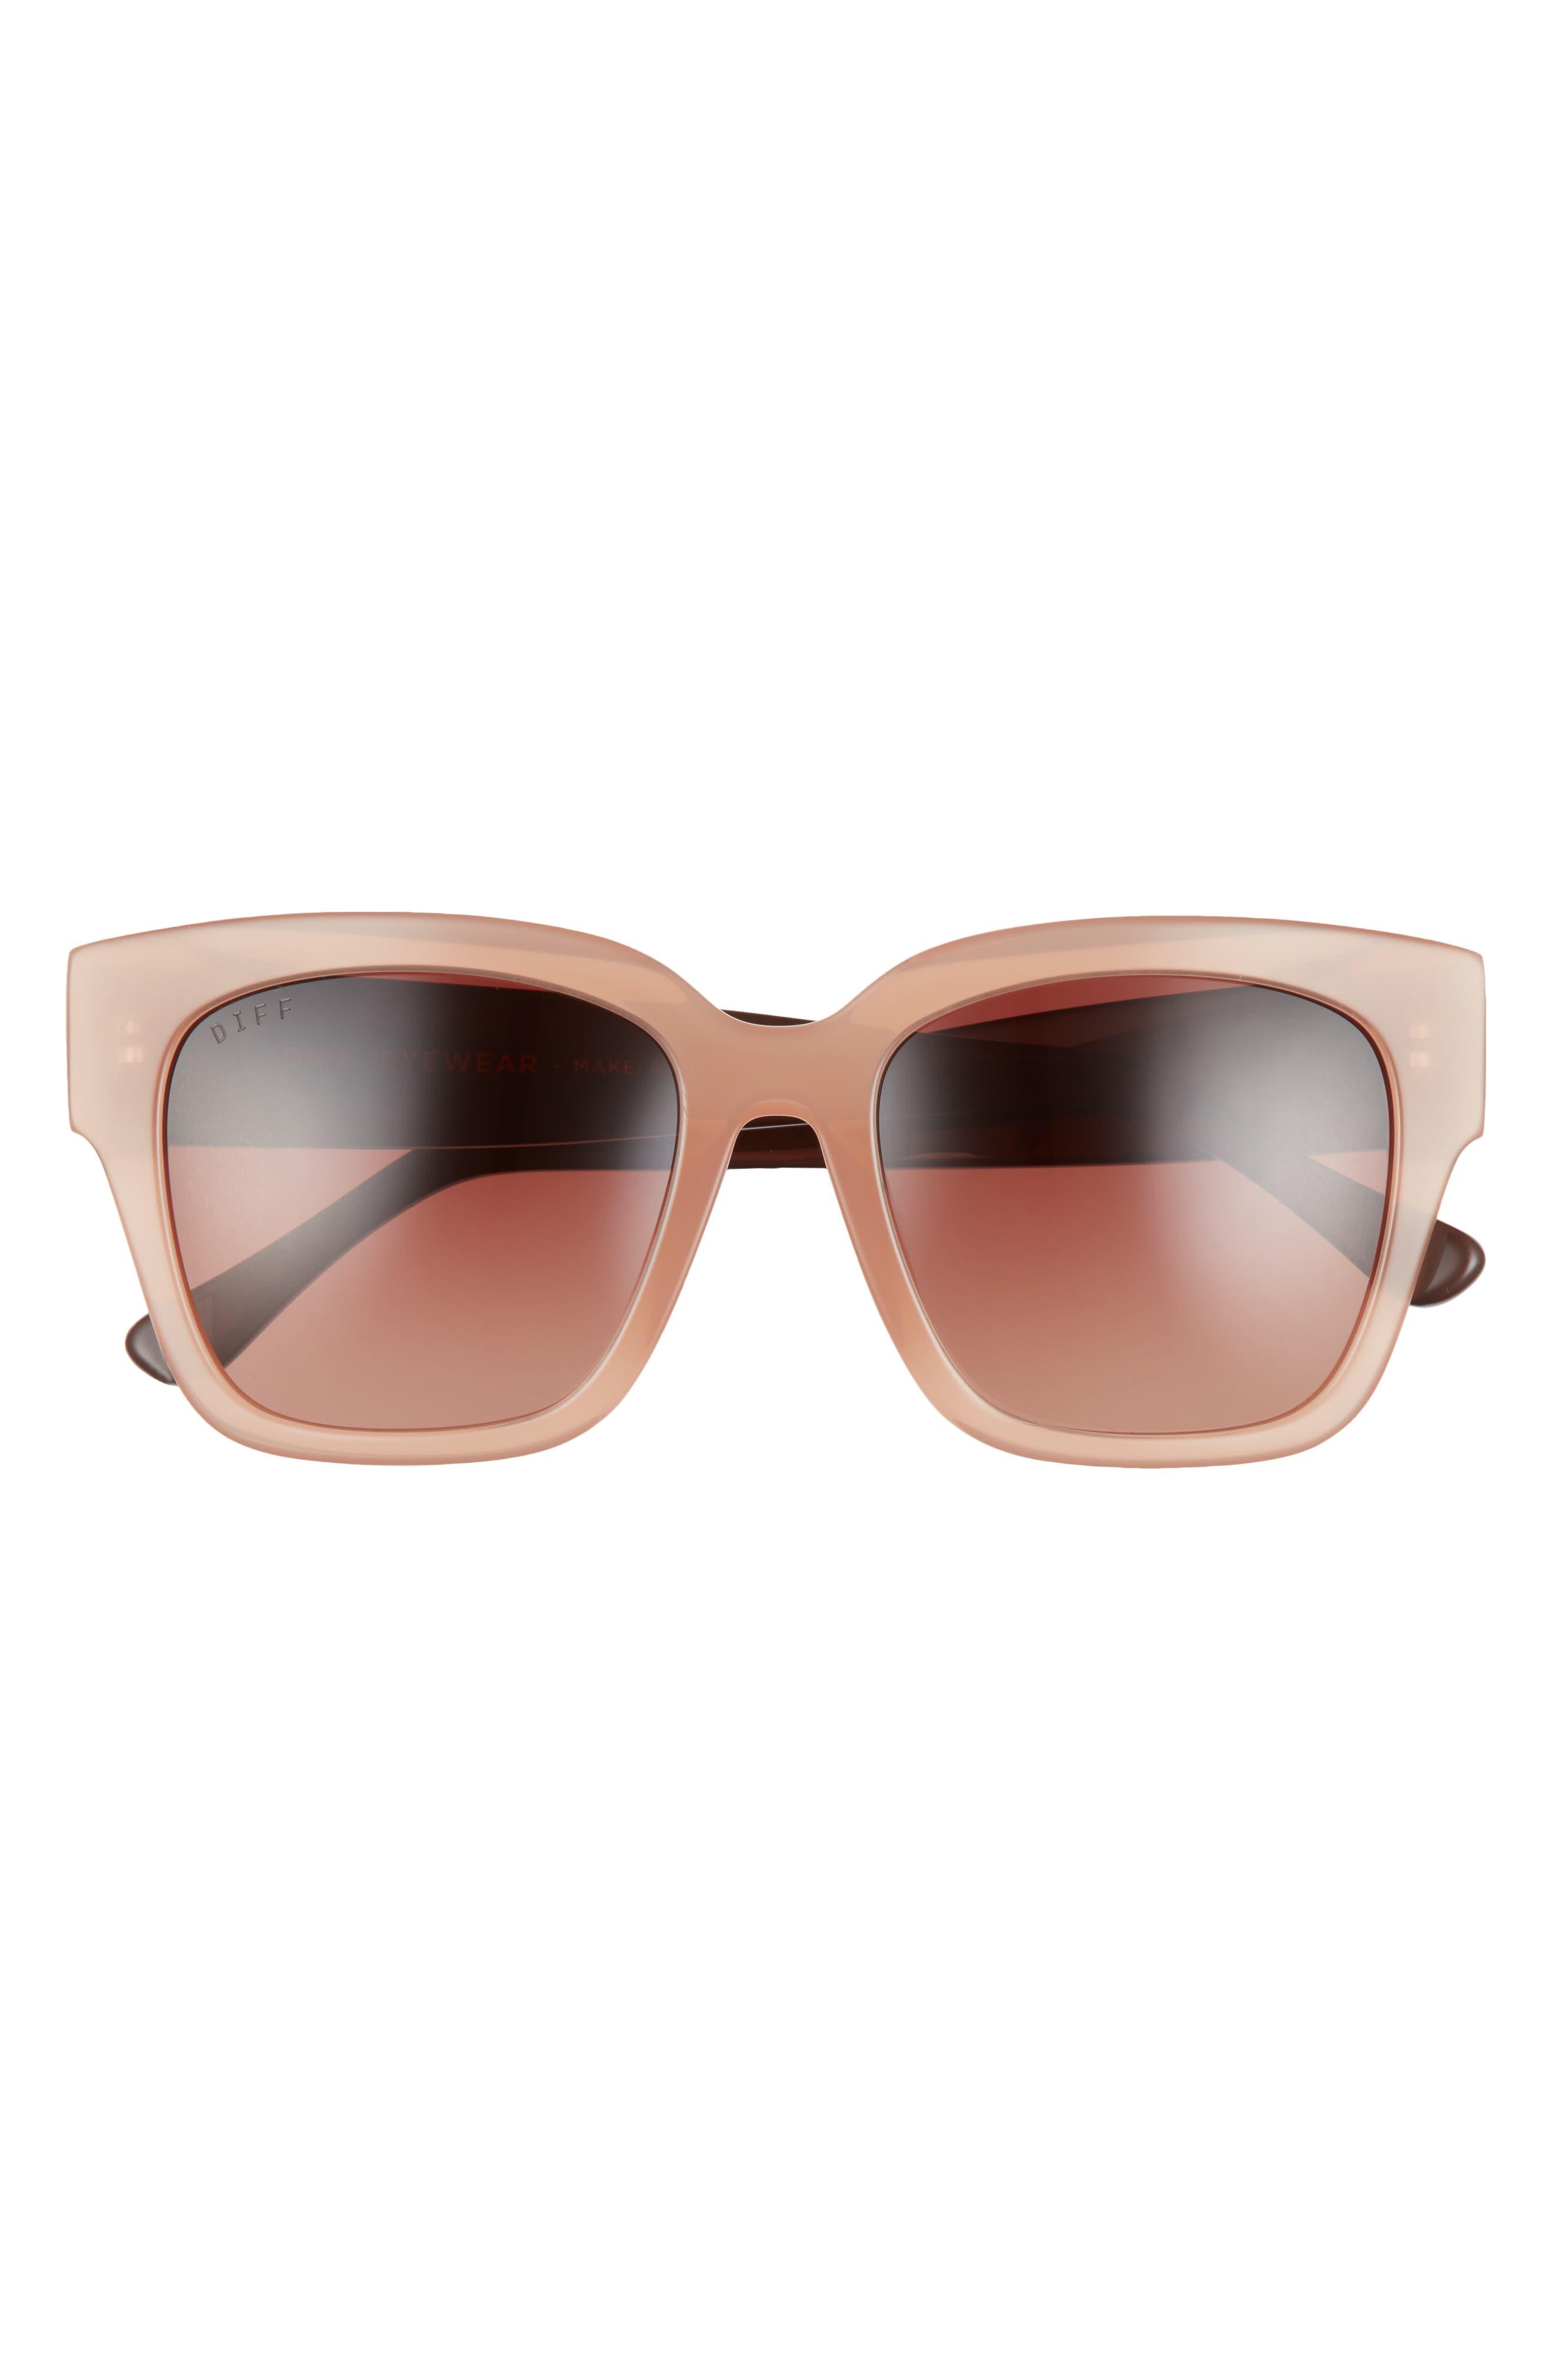 Bella Ii 54mm Square Sunglasses